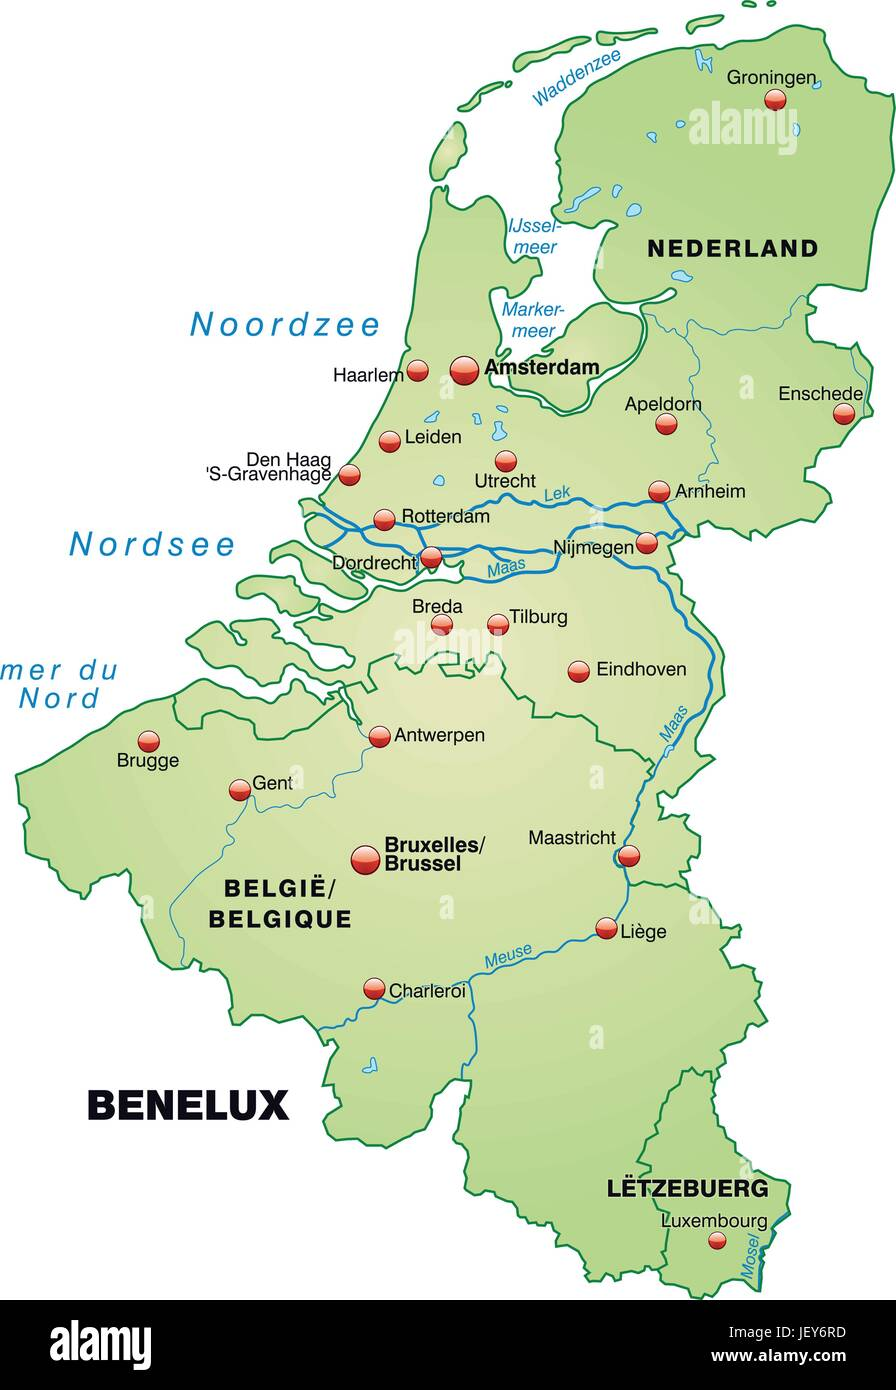 blgica holanda benelux la tarjeta el contorno las fronteras luxemburgo atlas mapa